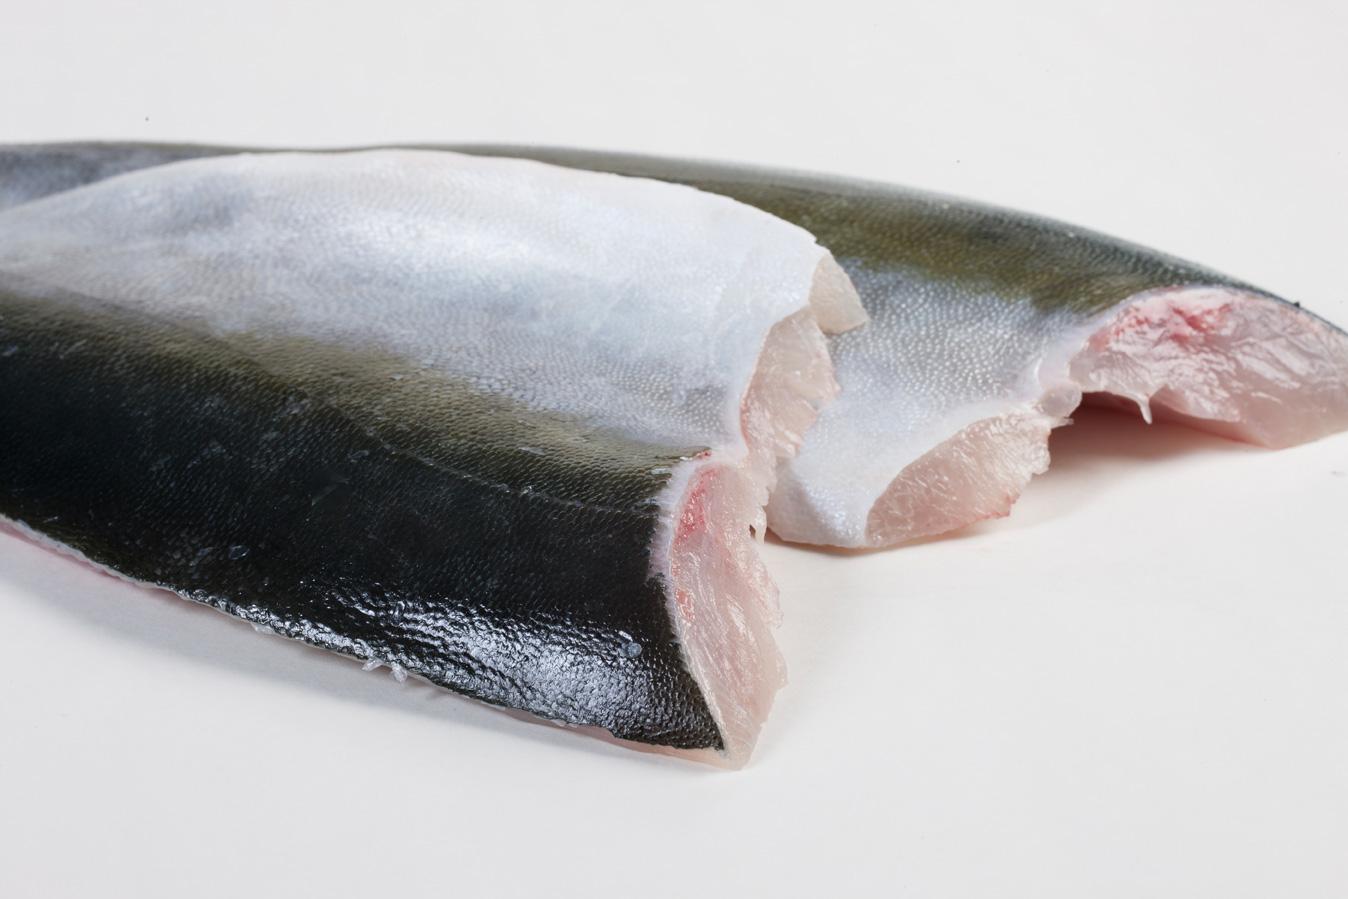 Groothandel-vis-FishXL-vis-hamachi-yellowtail-kingfish_WL_9136